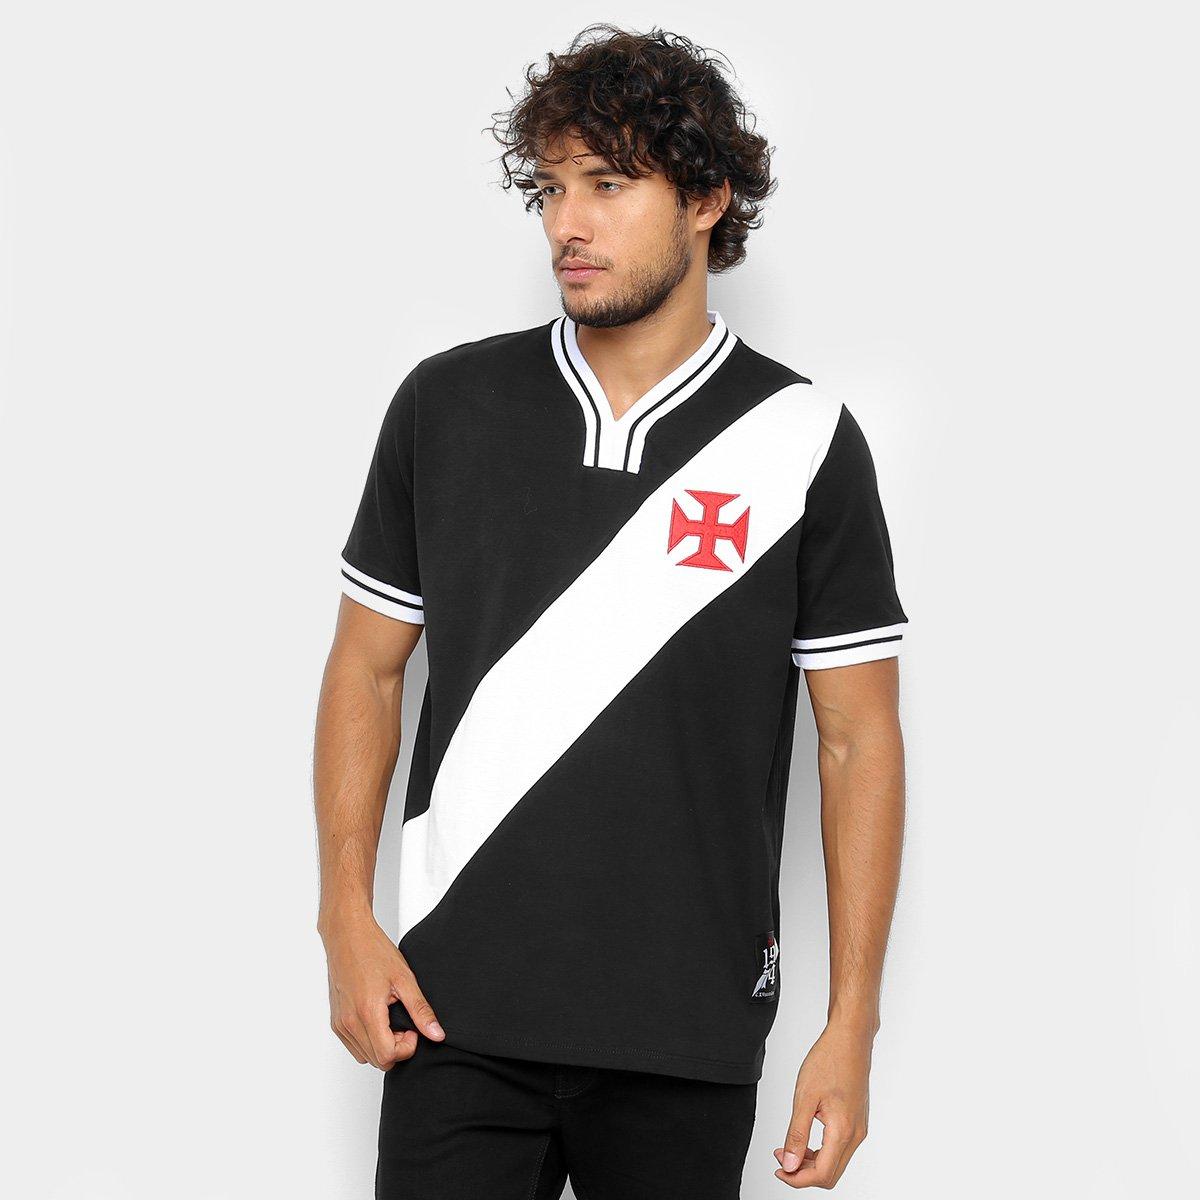 Camiseta do Vasco 74 Masculina - Preto e Branco - Compre Agora ... 16daaec51b94a